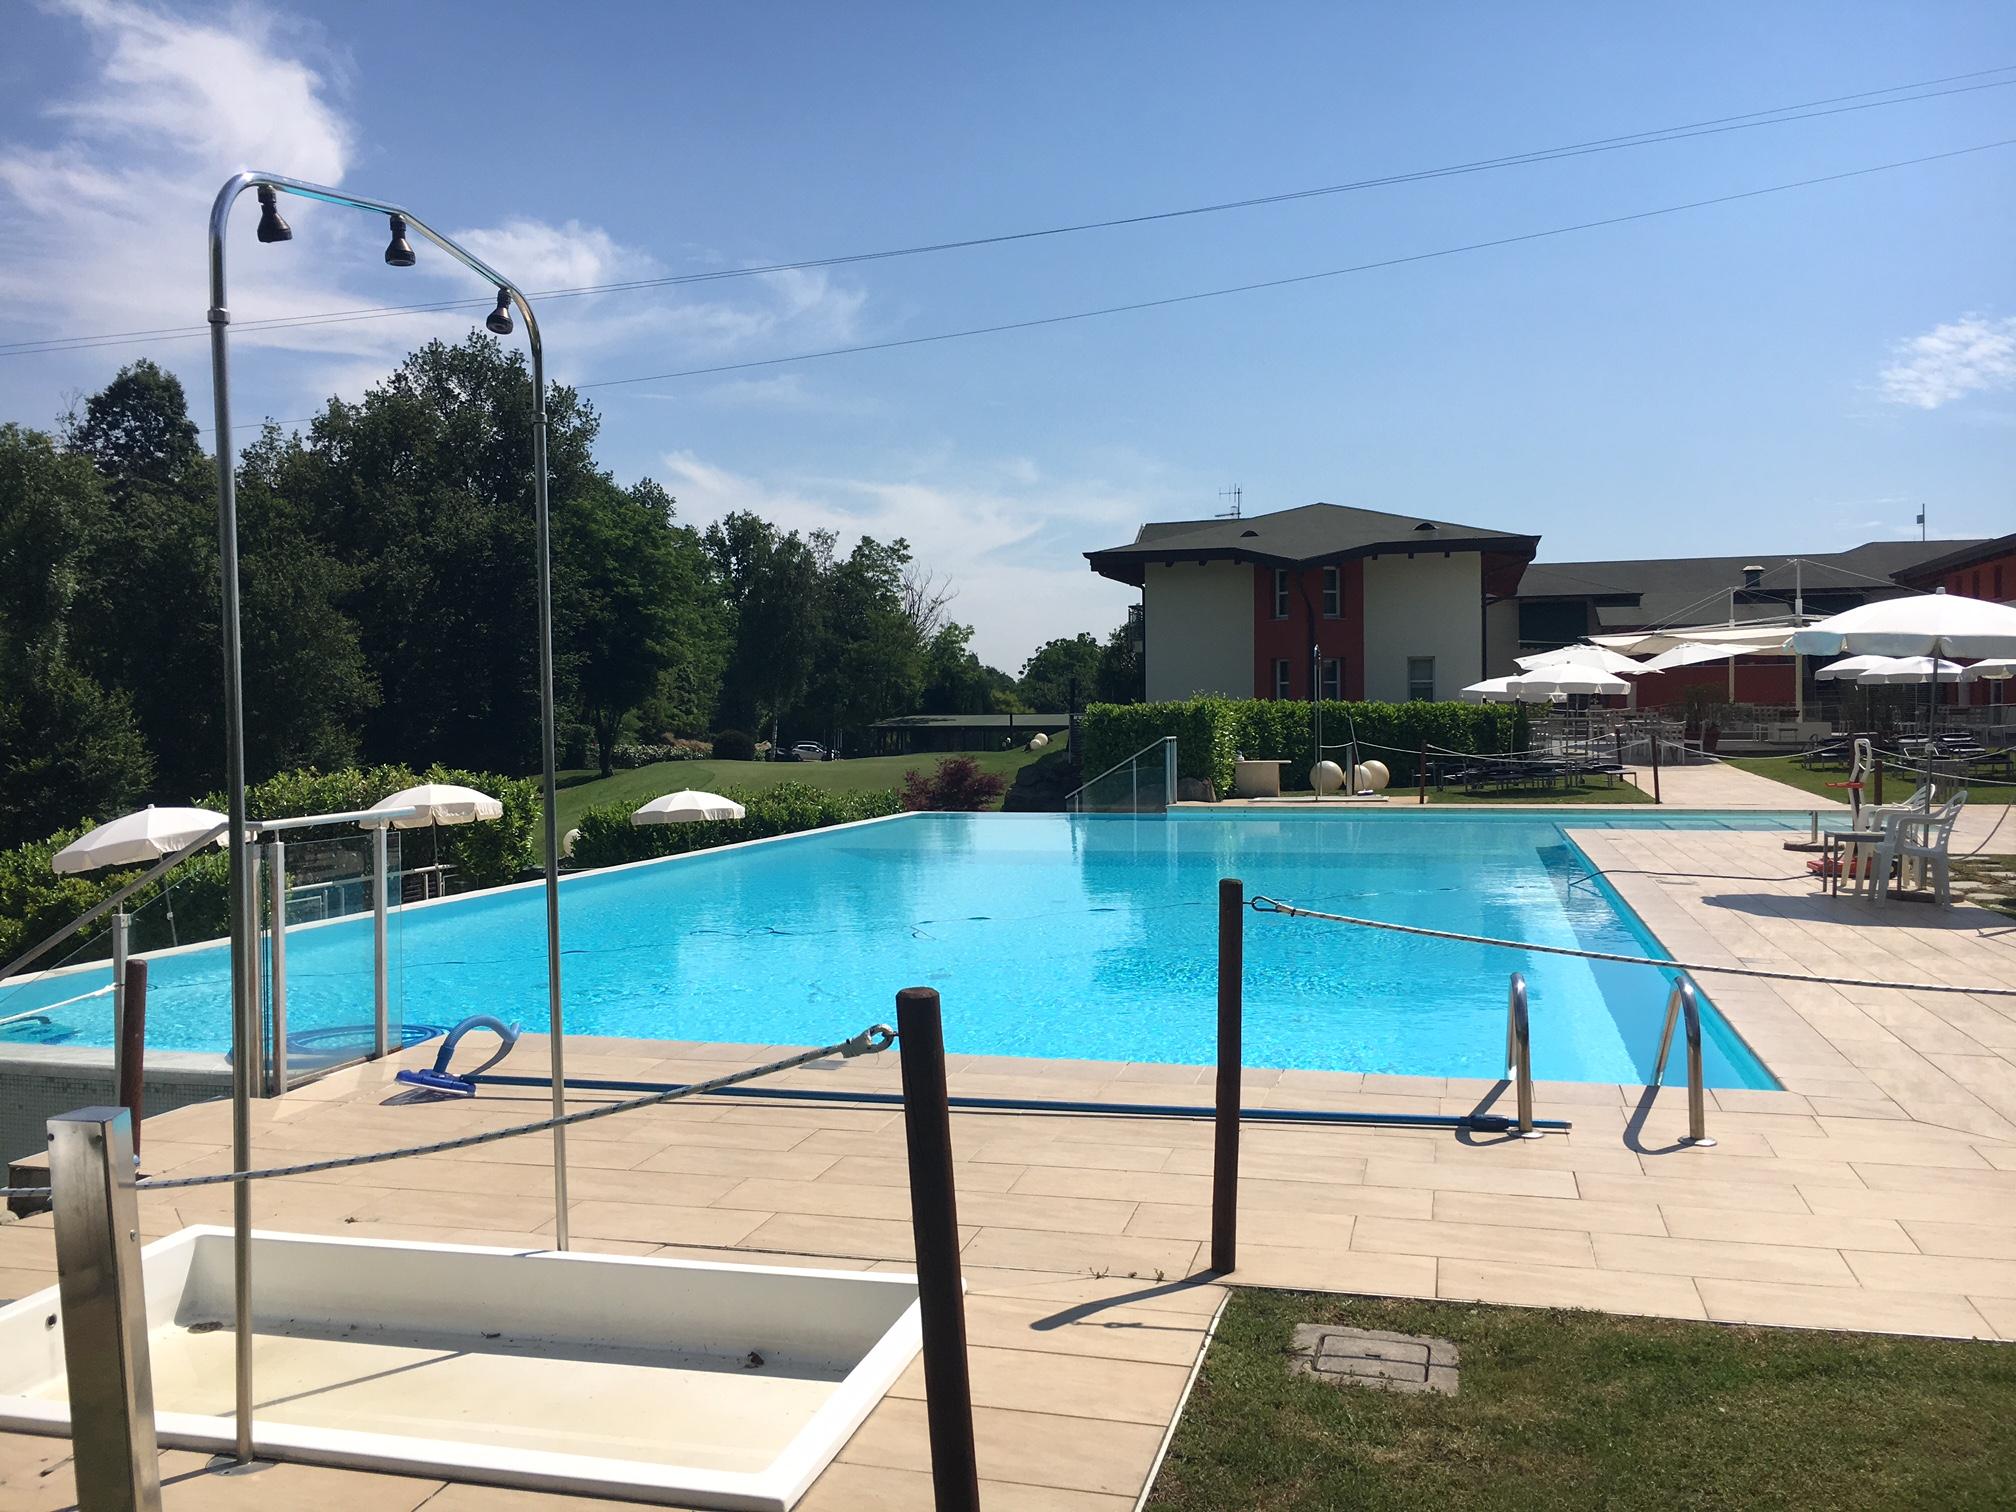 La piscina canavese golf country club - San giovanni in persiceto piscina ...